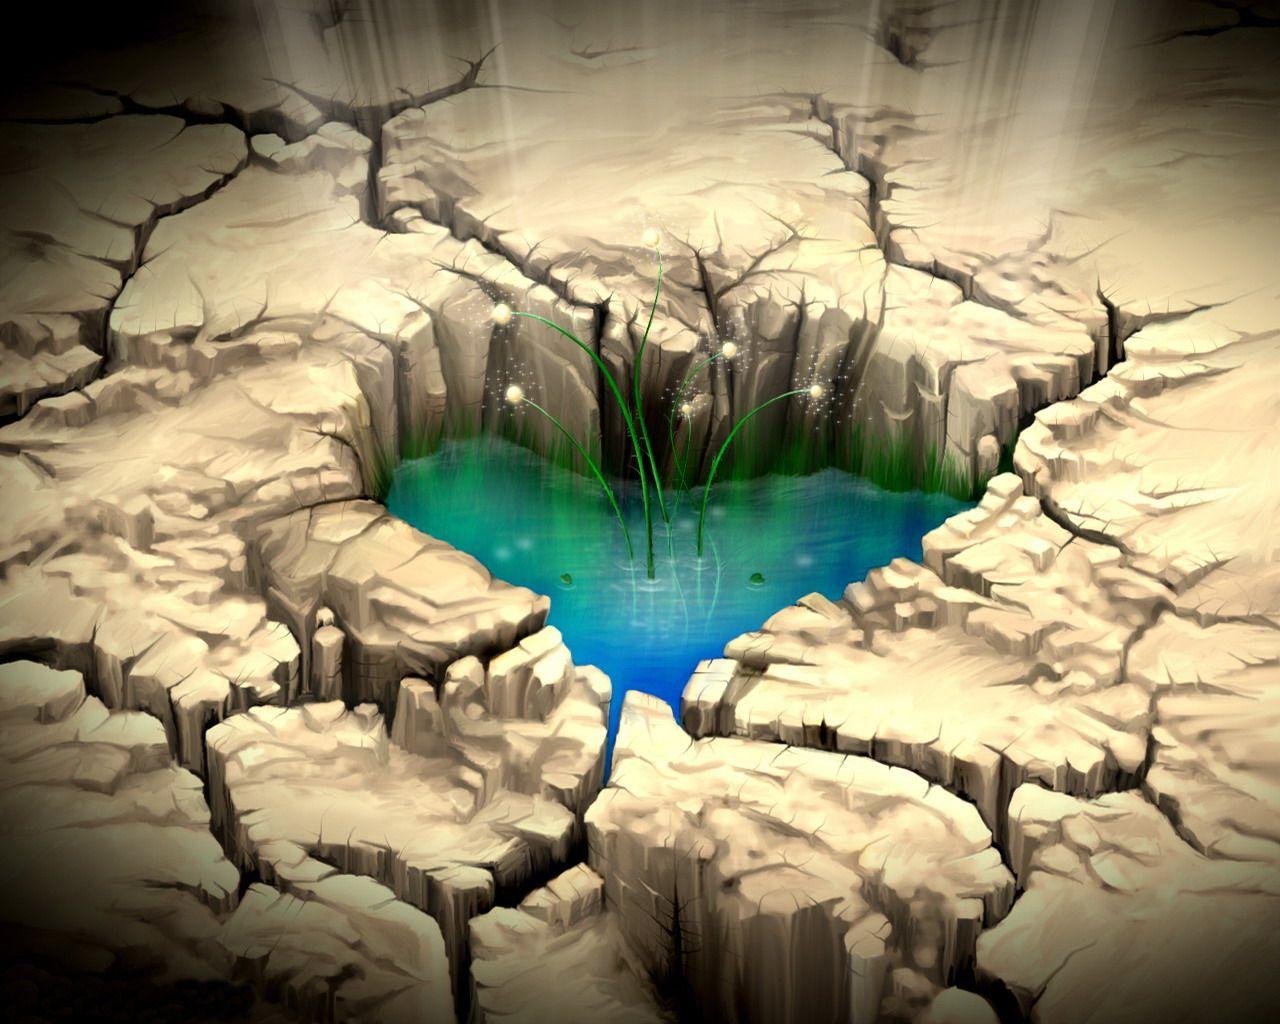 http://3.bp.blogspot.com/-W_Xx-KZDFB8/ThAFkKyF5jI/AAAAAAAAAxk/mE50yCWuTAY/s1600/Pond+Heart-72690.jpeg